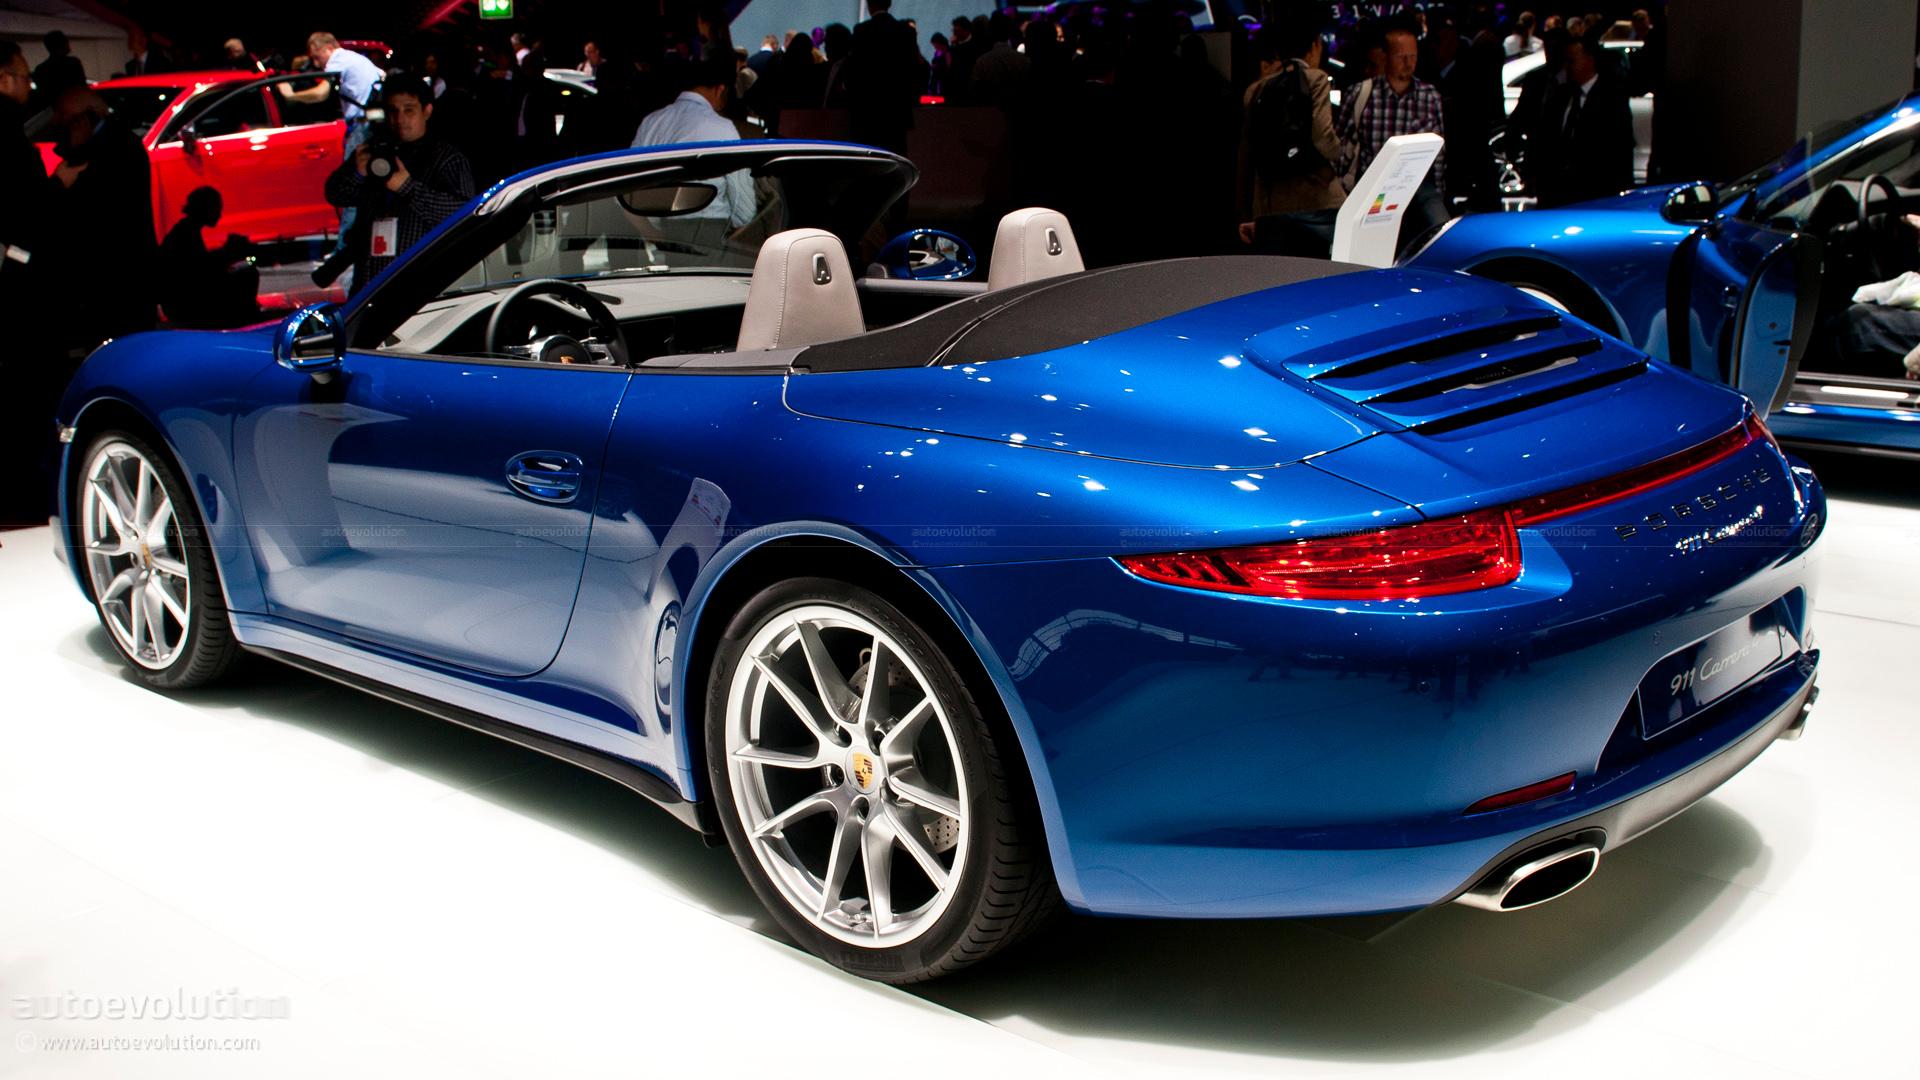 paris 2012 porsche 911 carrera4 cabriolet live photos autoevolution. Black Bedroom Furniture Sets. Home Design Ideas